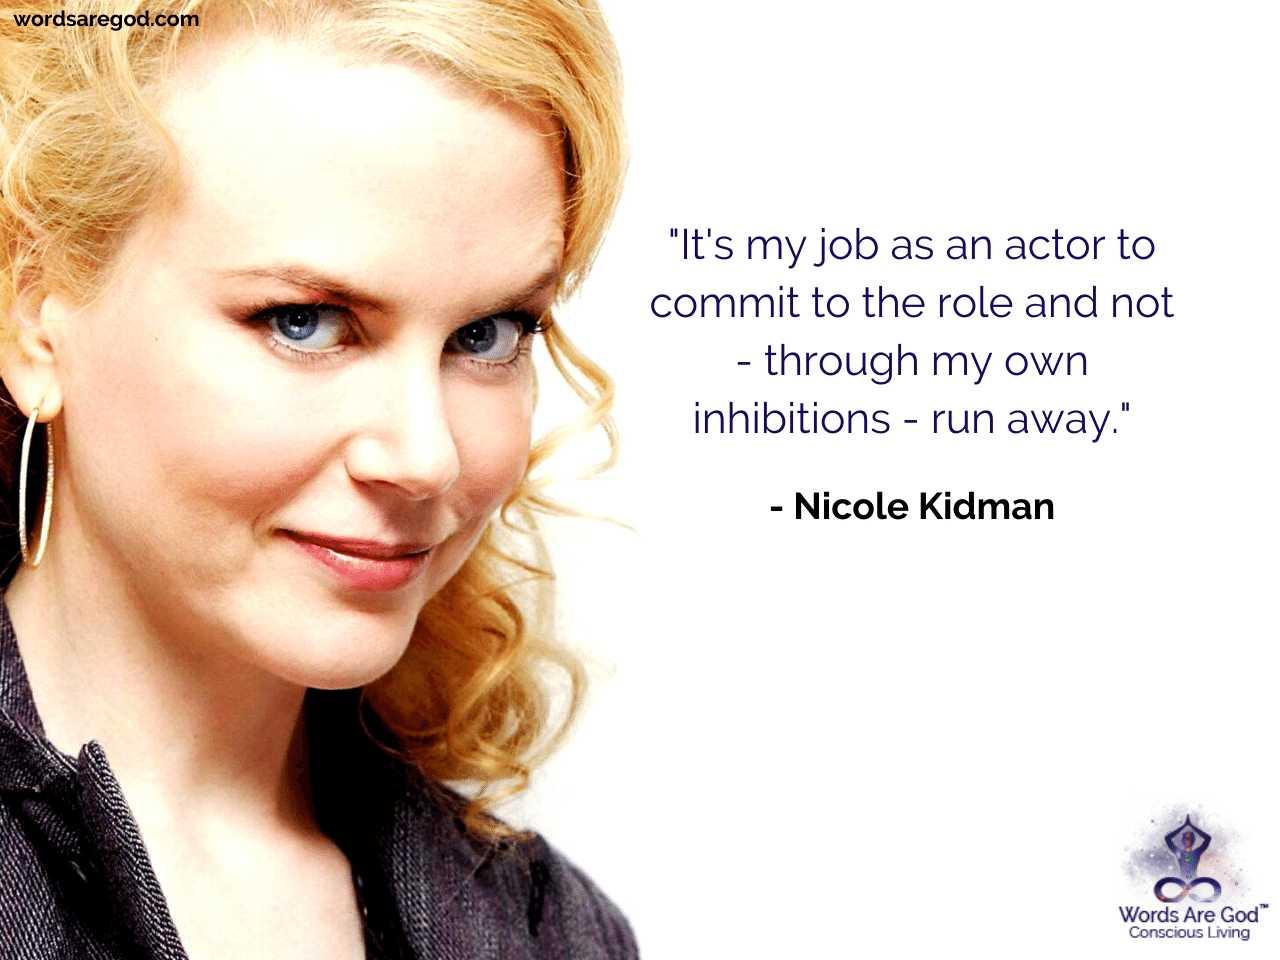 Nicole Kidman Inspirational Quote